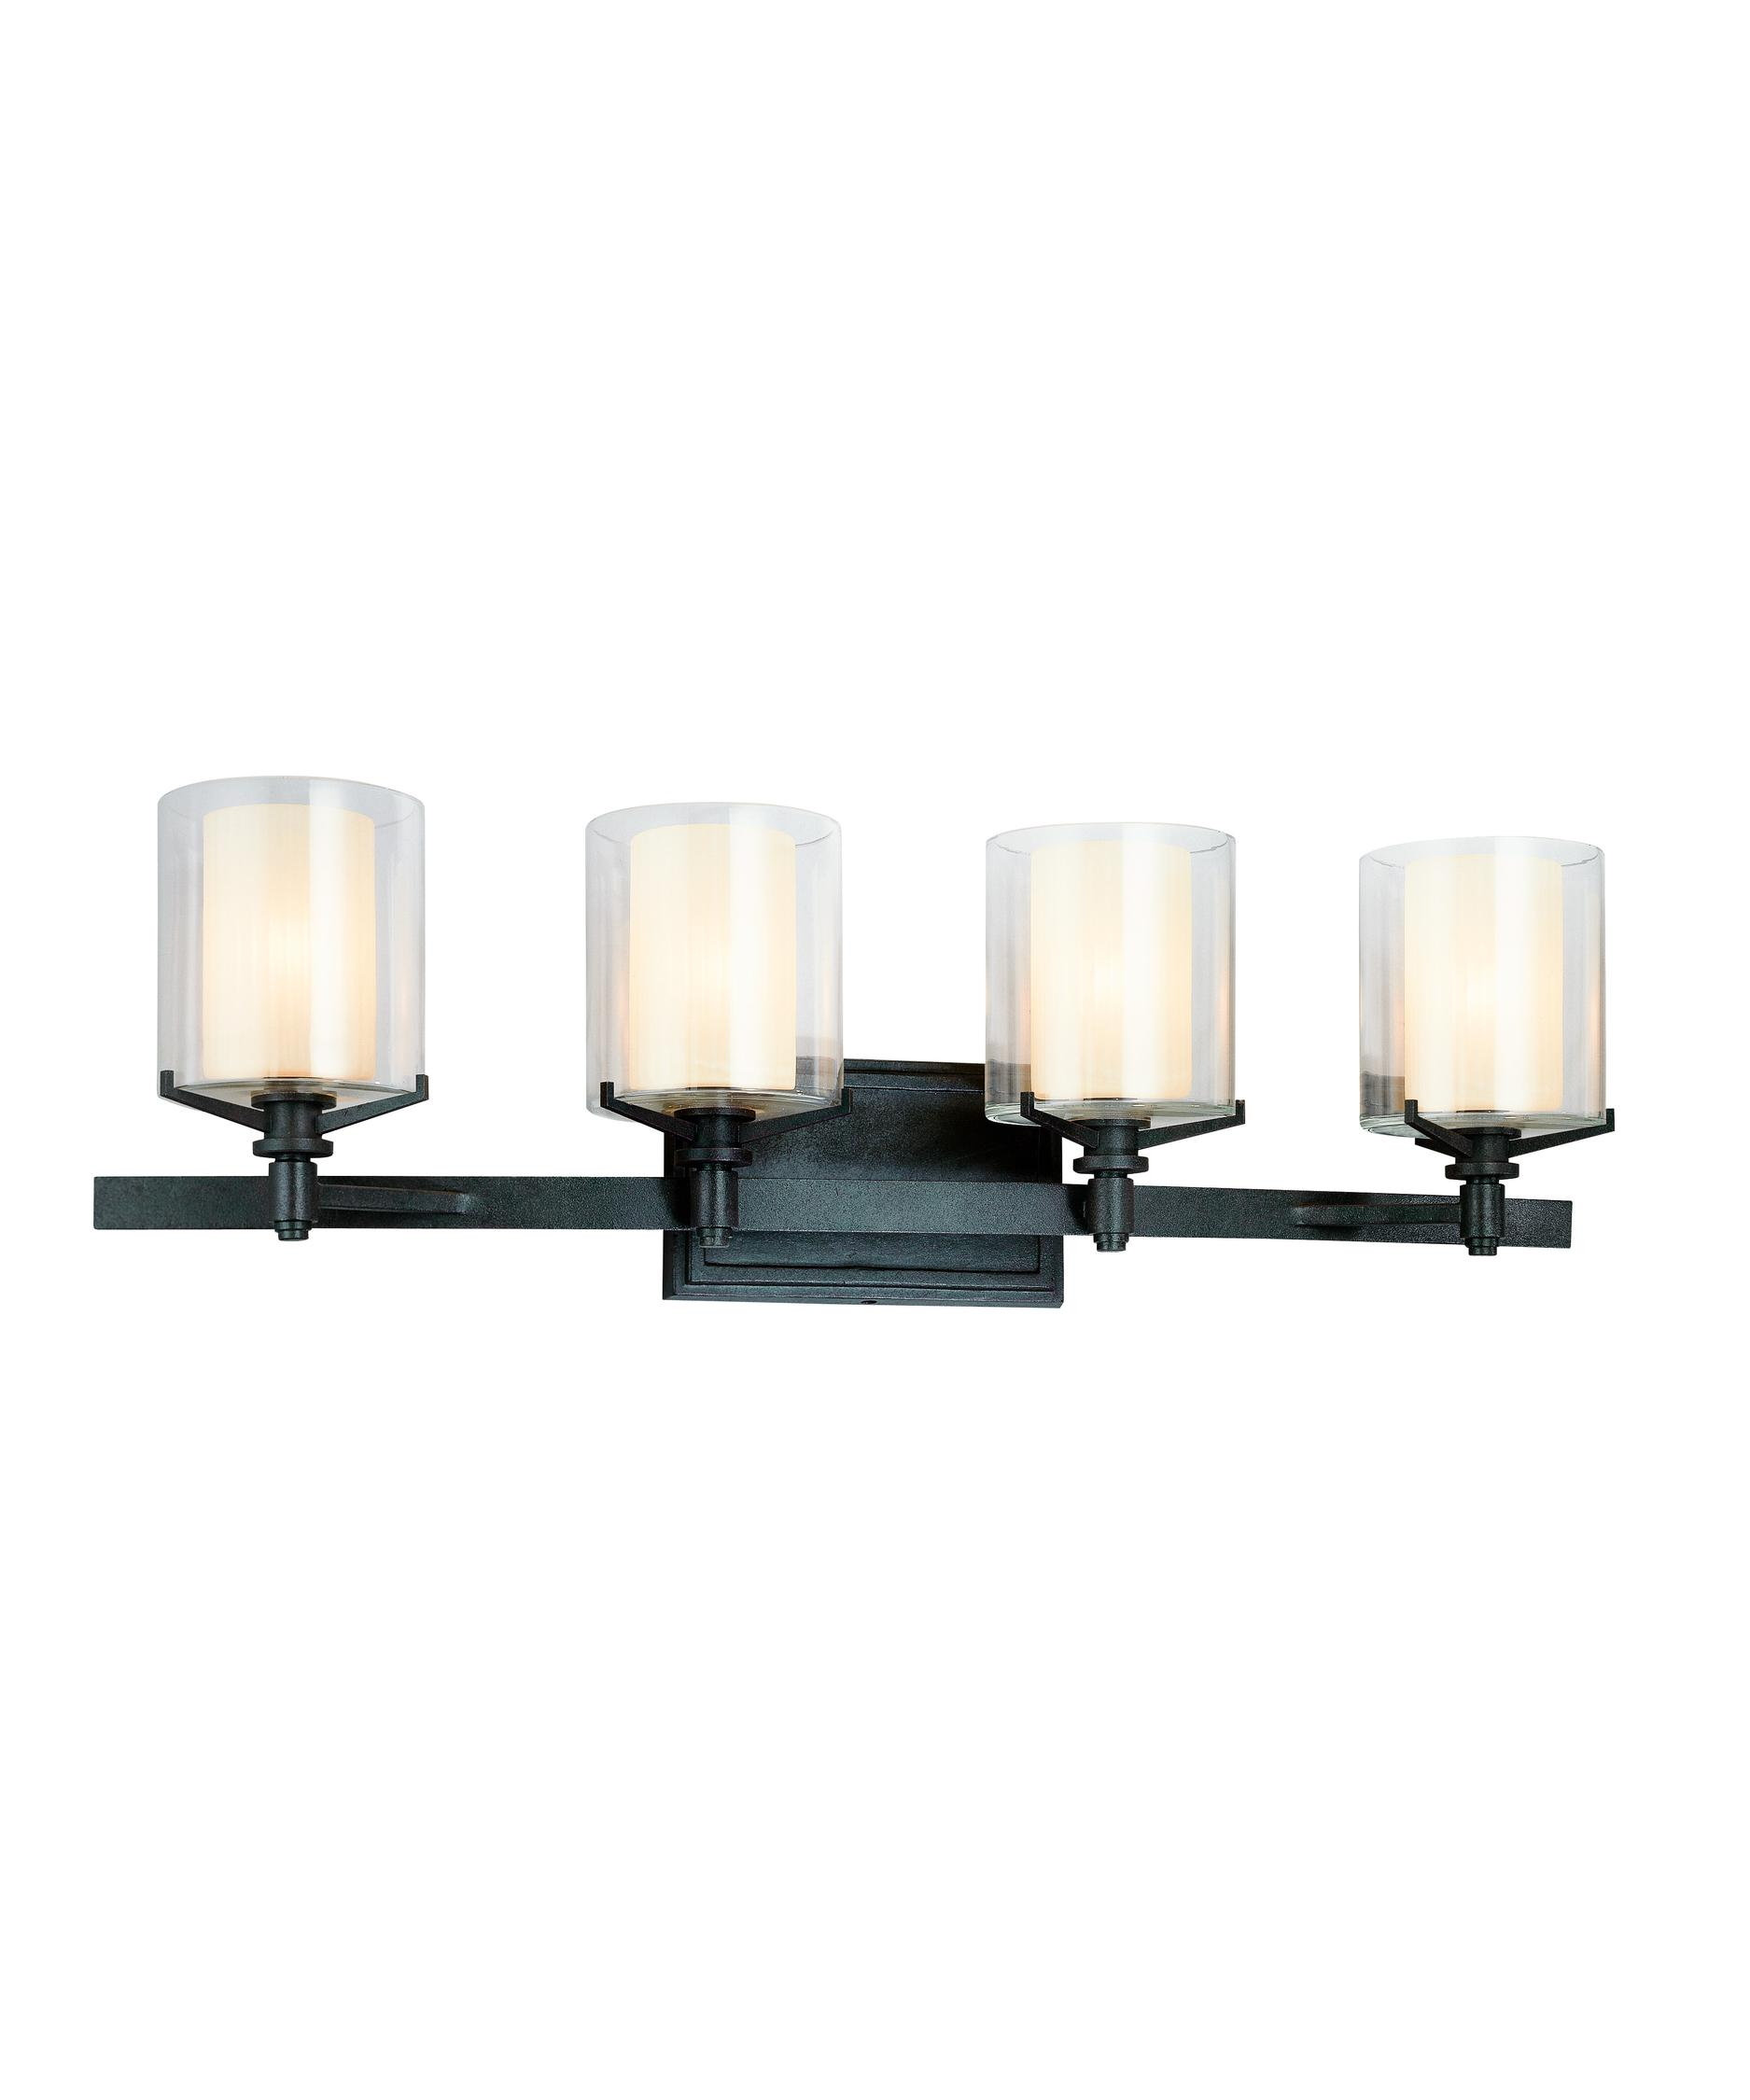 Bathroom Vanity Lights For Sale troy lighting b1714 arcadia 30 inch wide bath vanity light